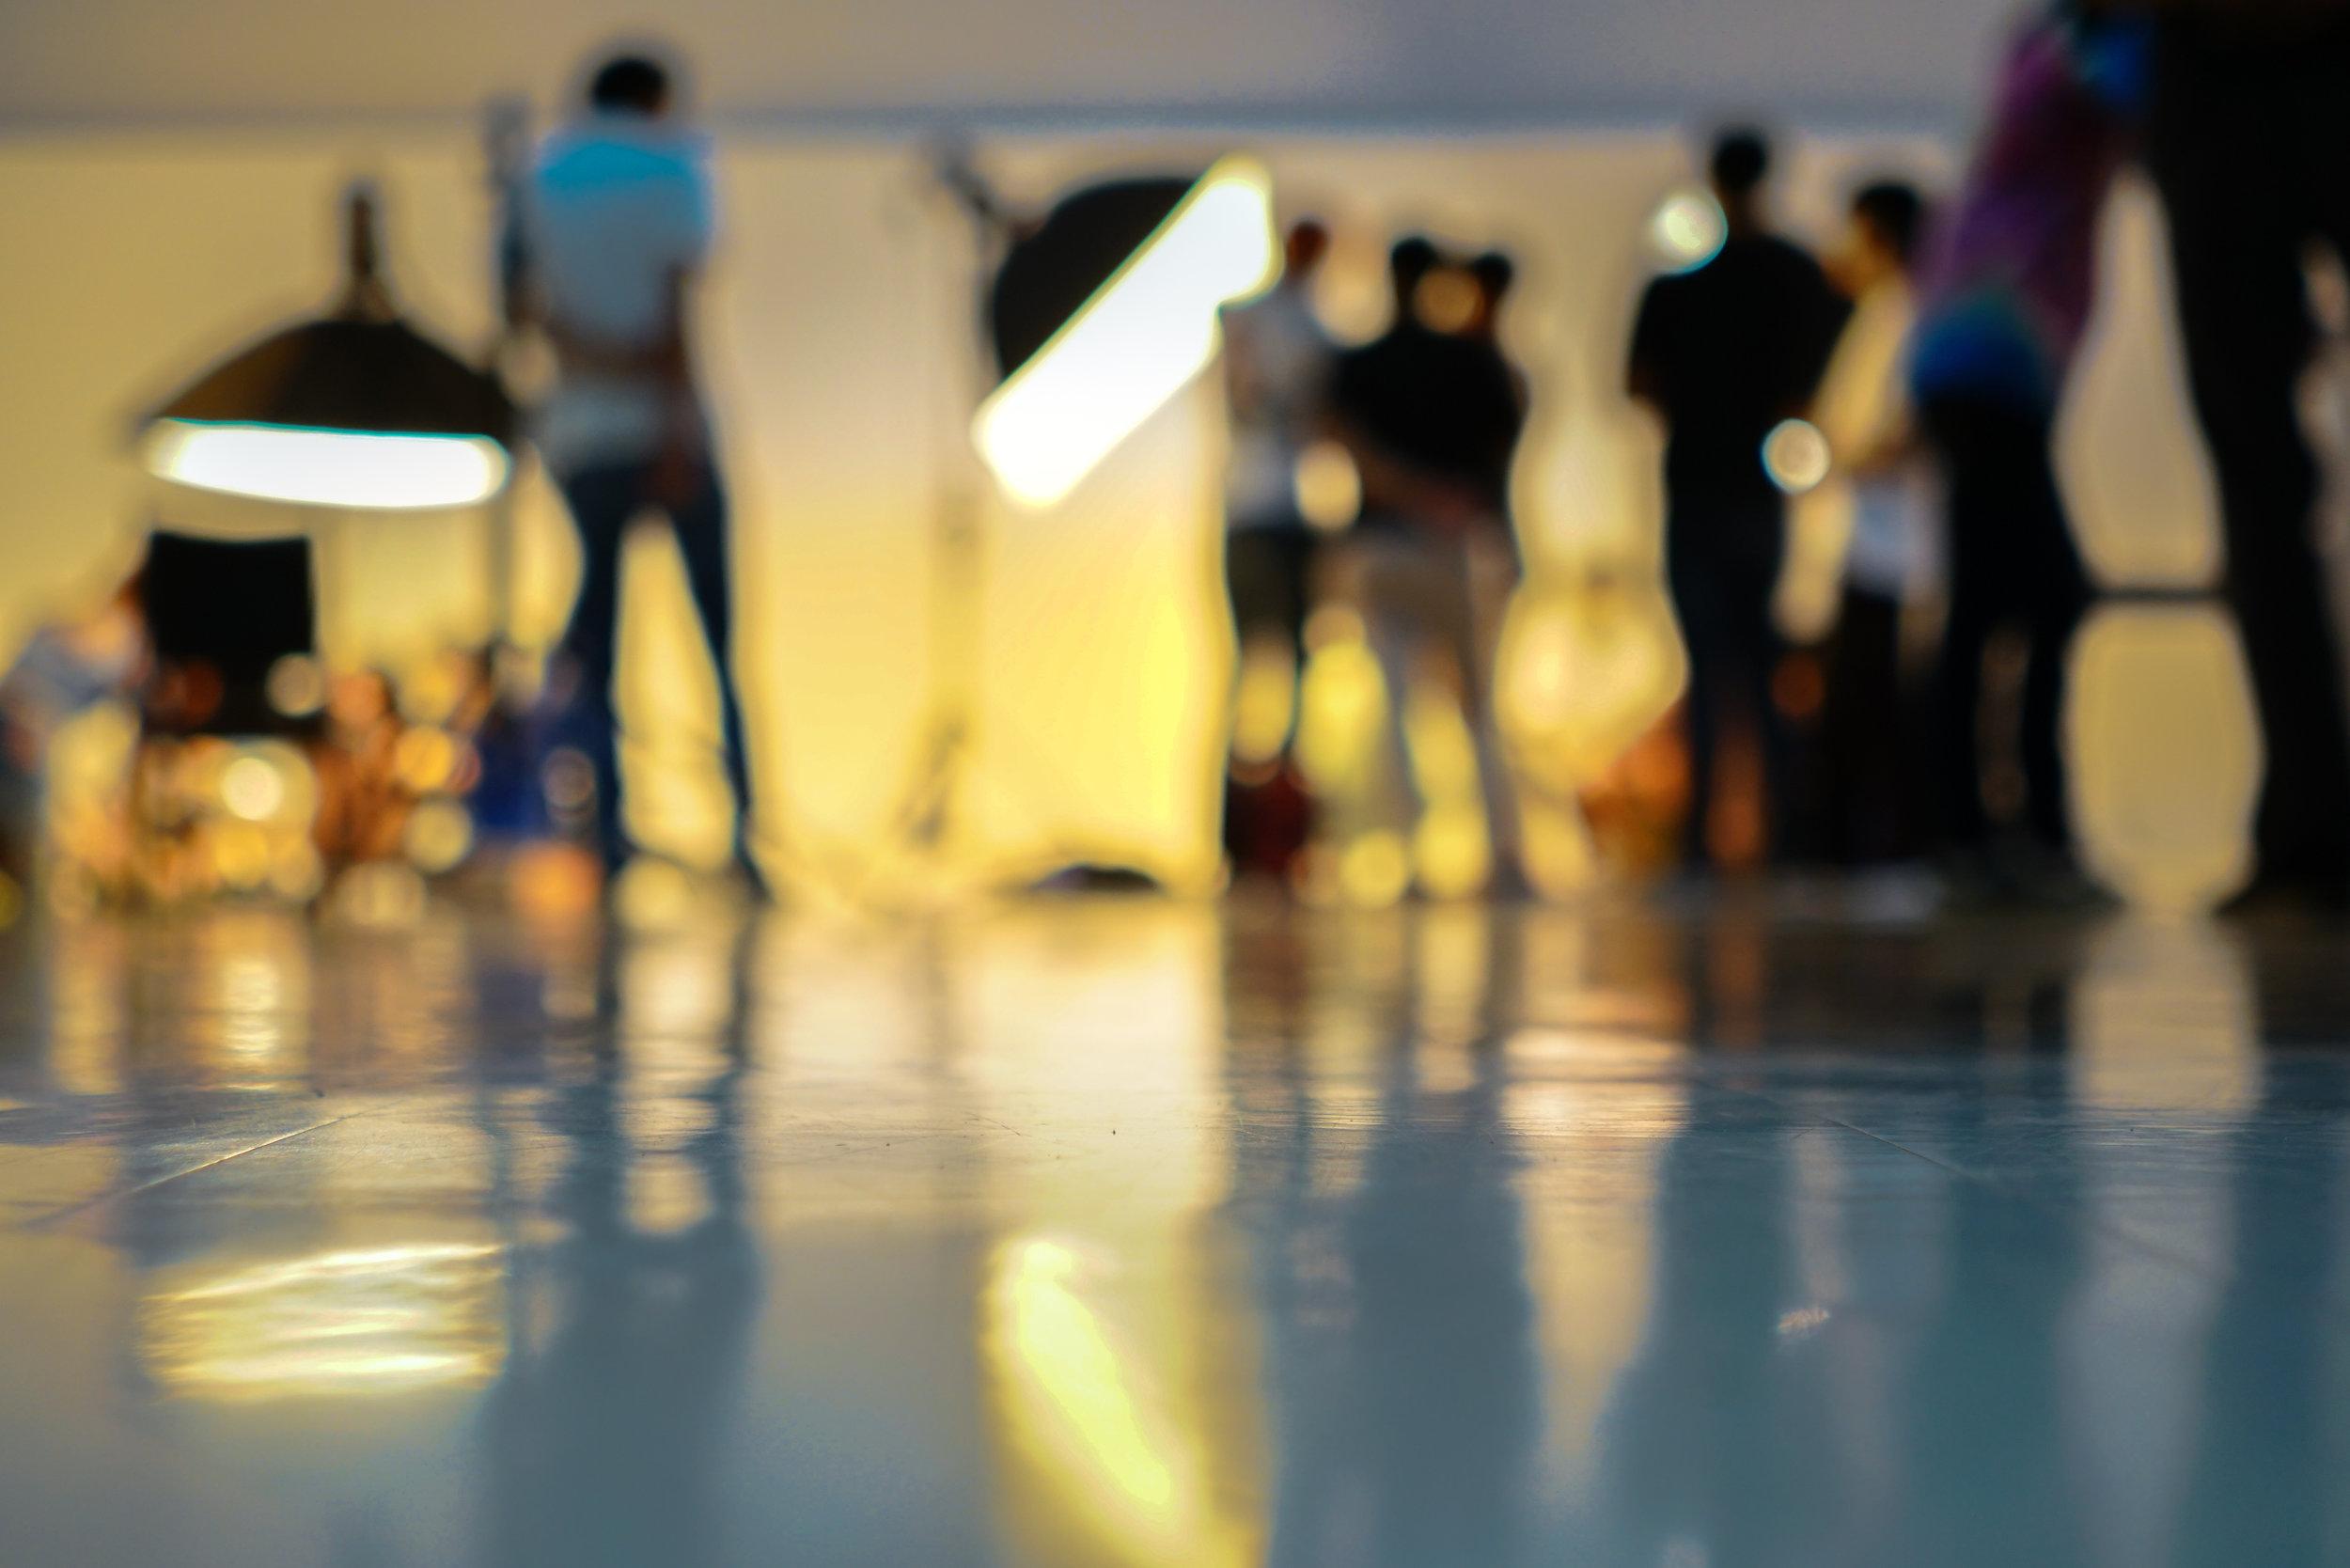 stock-photo-blurry-image-in-studio-working-advertising-with-strobe-flash-or-studio-flash-614118065.jpg